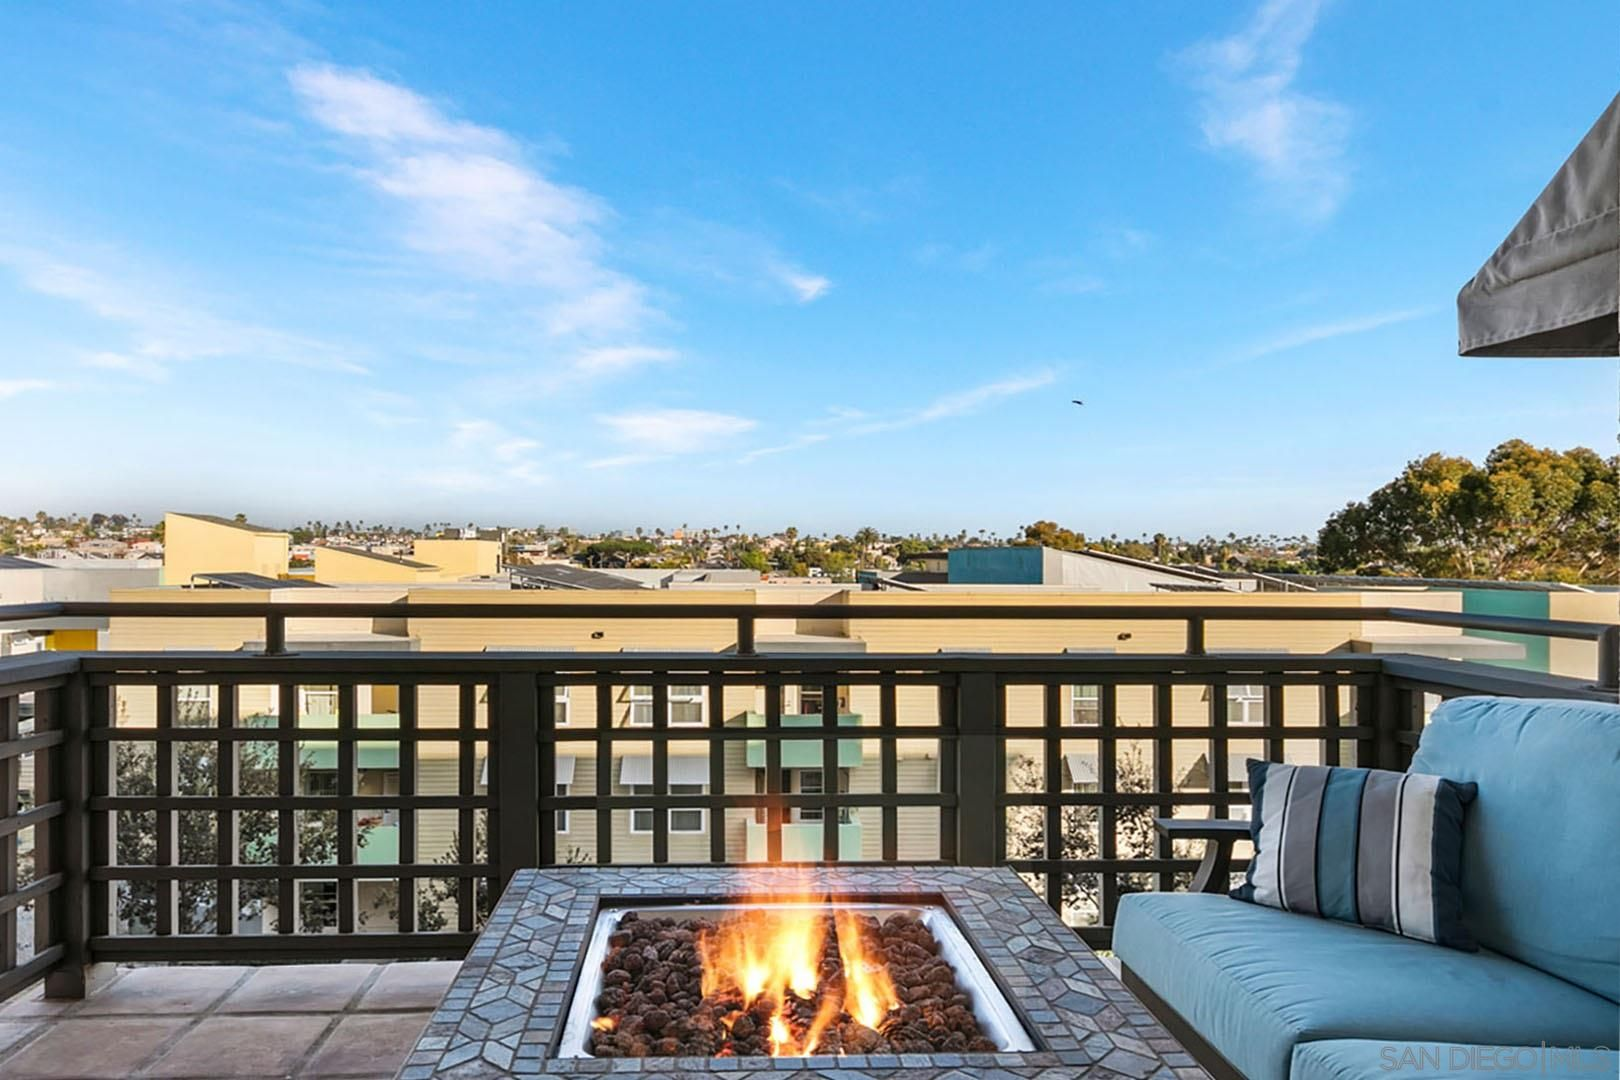 Main Photo: NORTH PARK Condo for sale : 2 bedrooms : 3790 Florida St #AL08 in San Diego